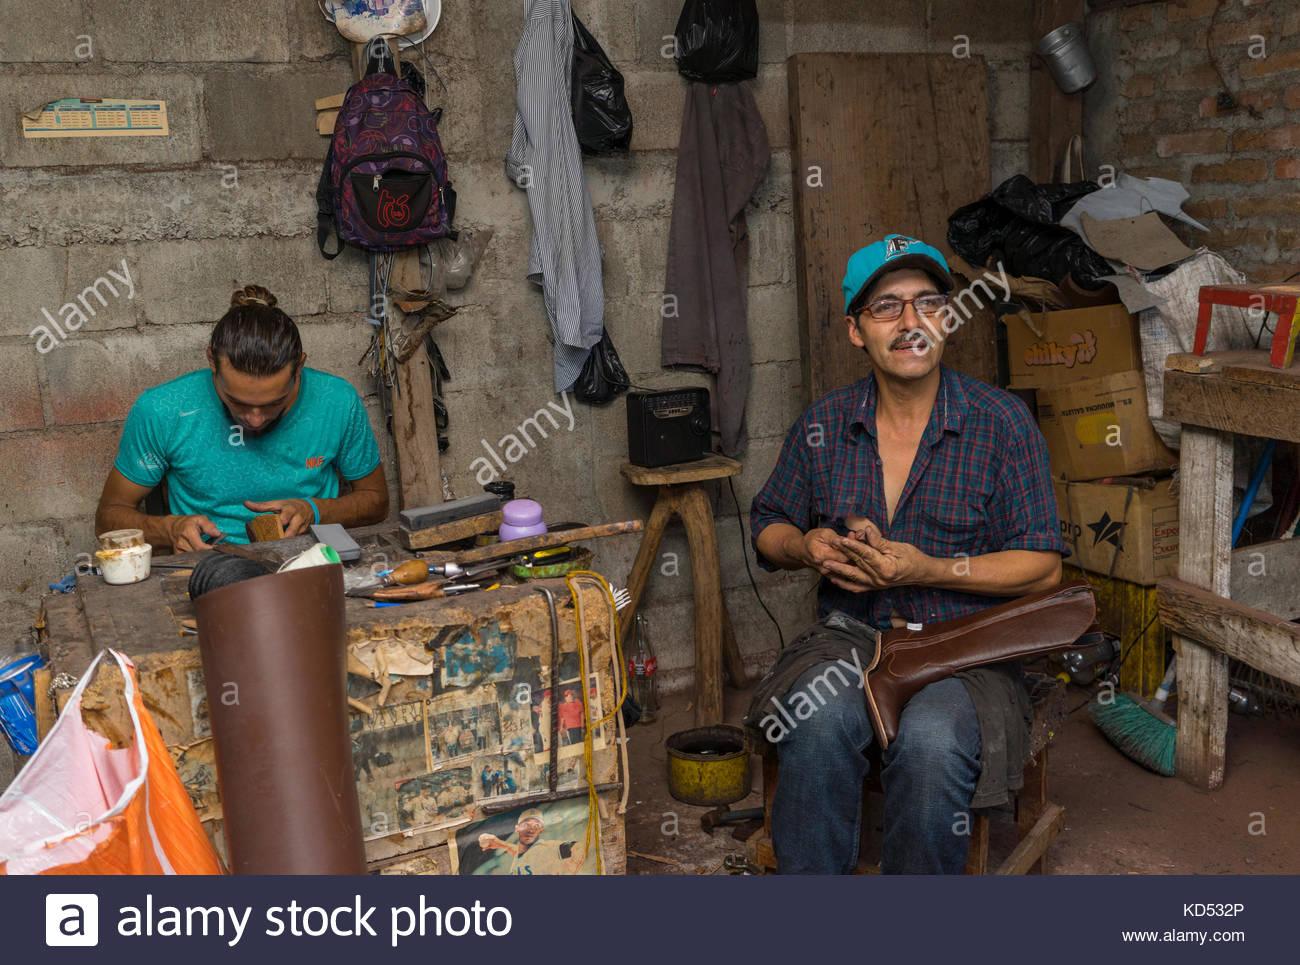 men-working-in-cobblers-shop-KD532P.jpg